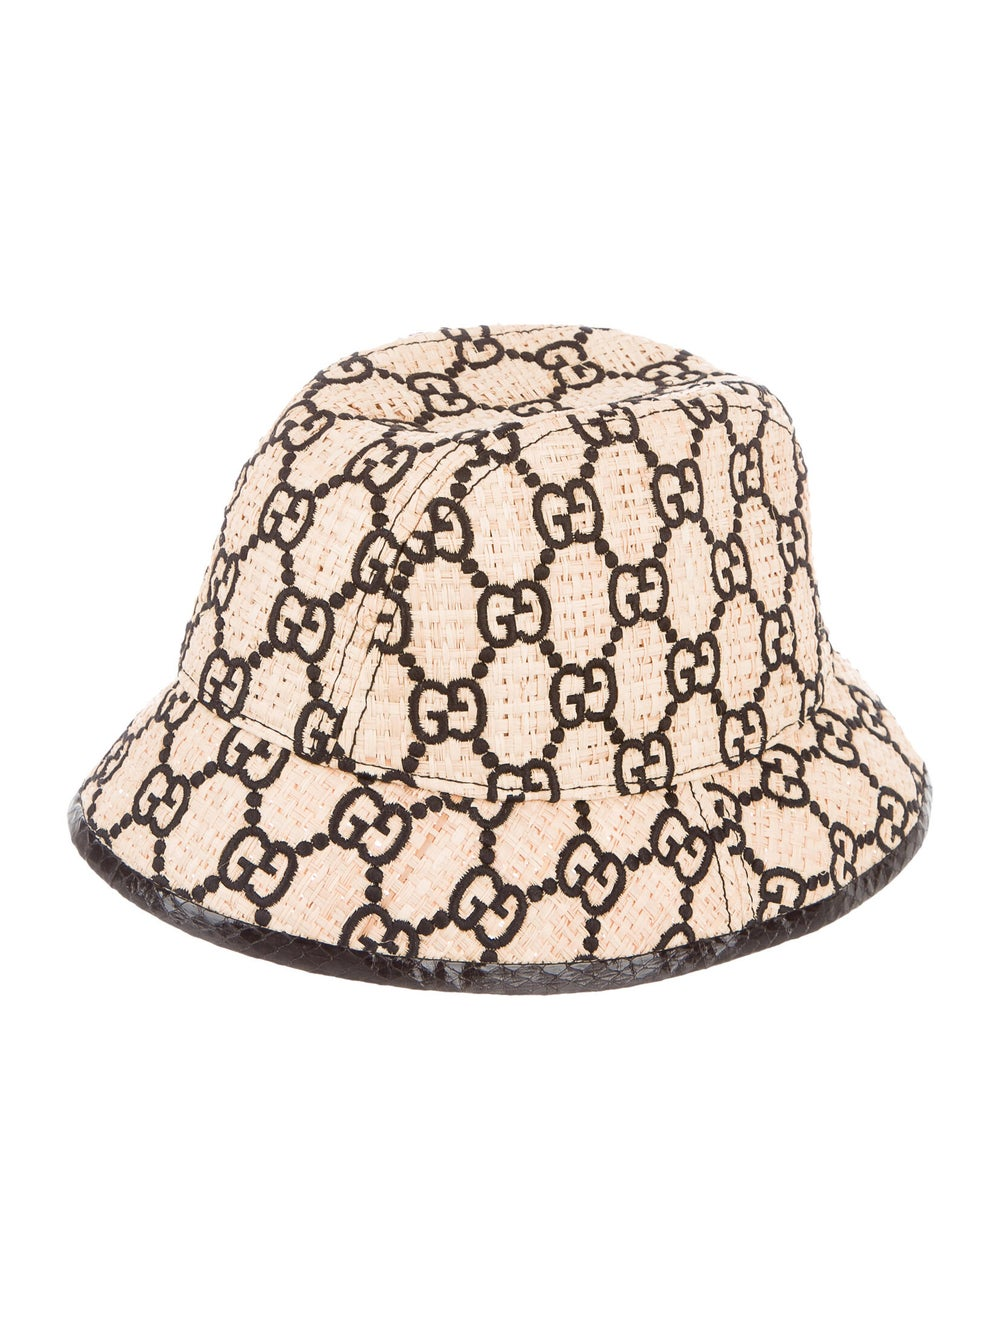 Gucci GG Straw Fedora Hat Tan - image 2